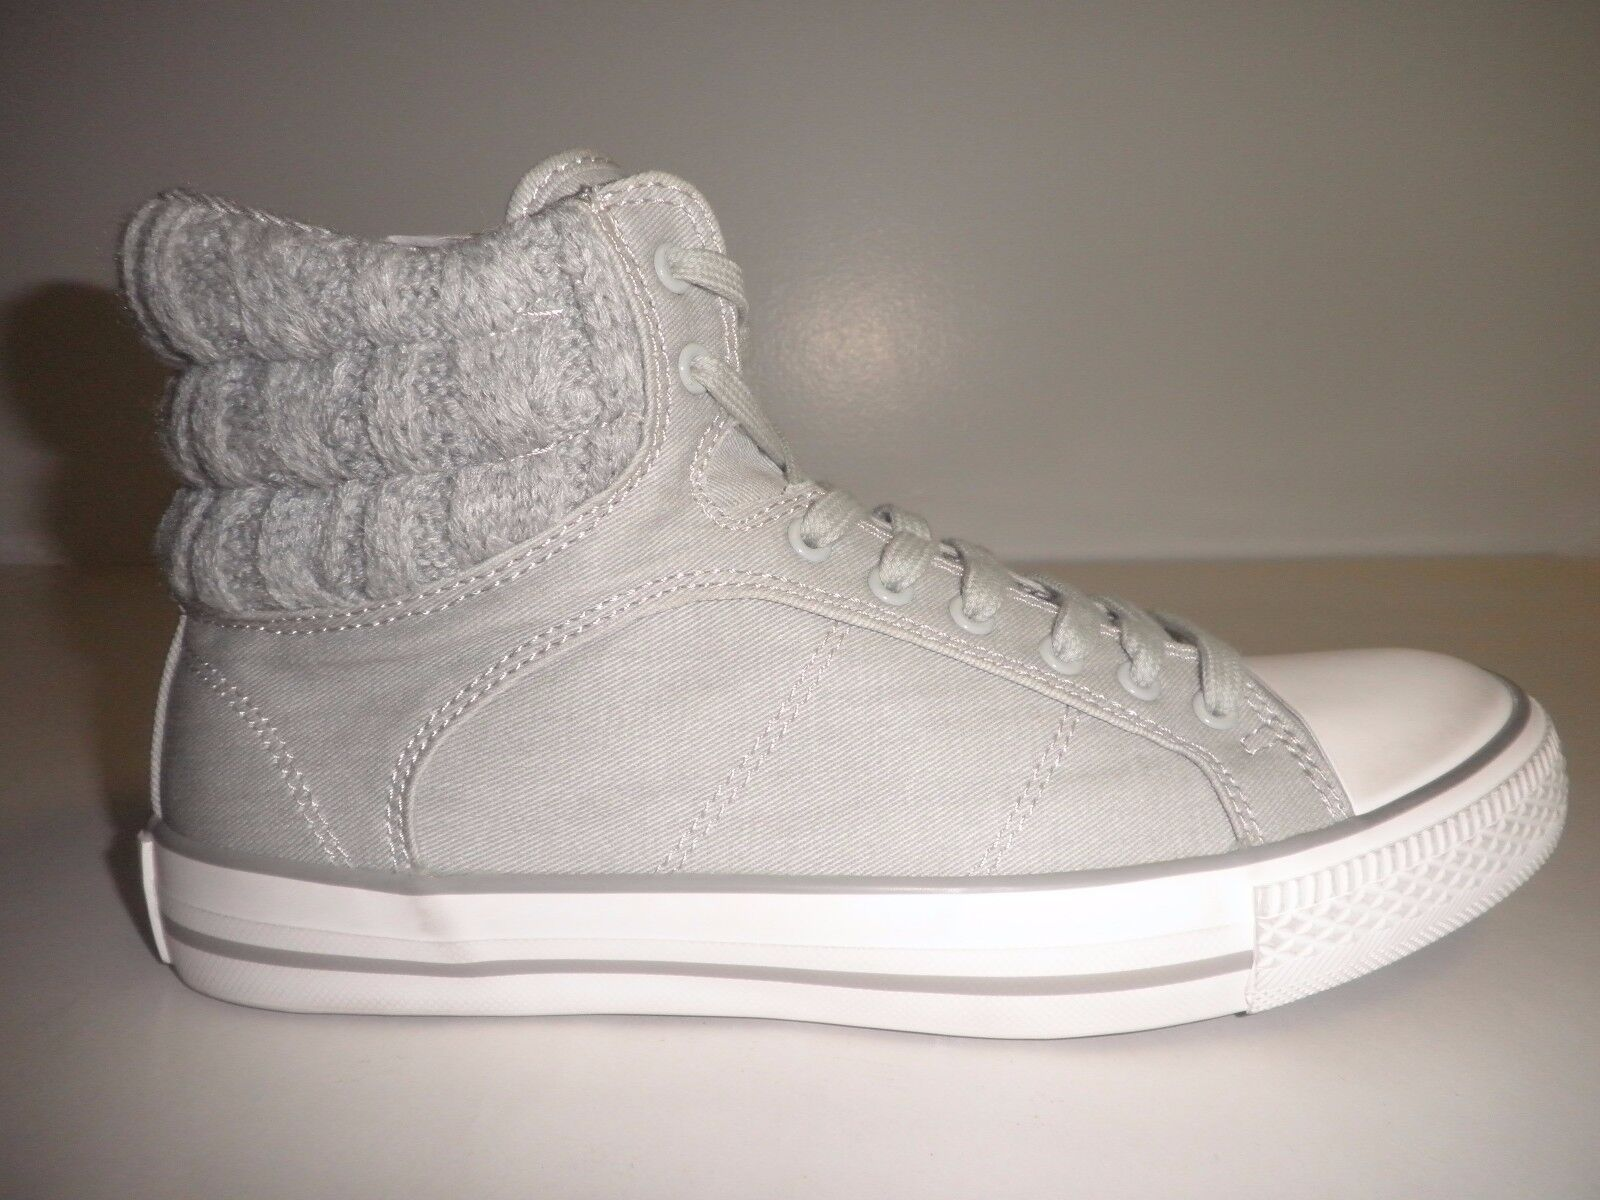 Splendid Size 7.5 M ESSEX  Grey Fashion Sneakers New Womens shoes